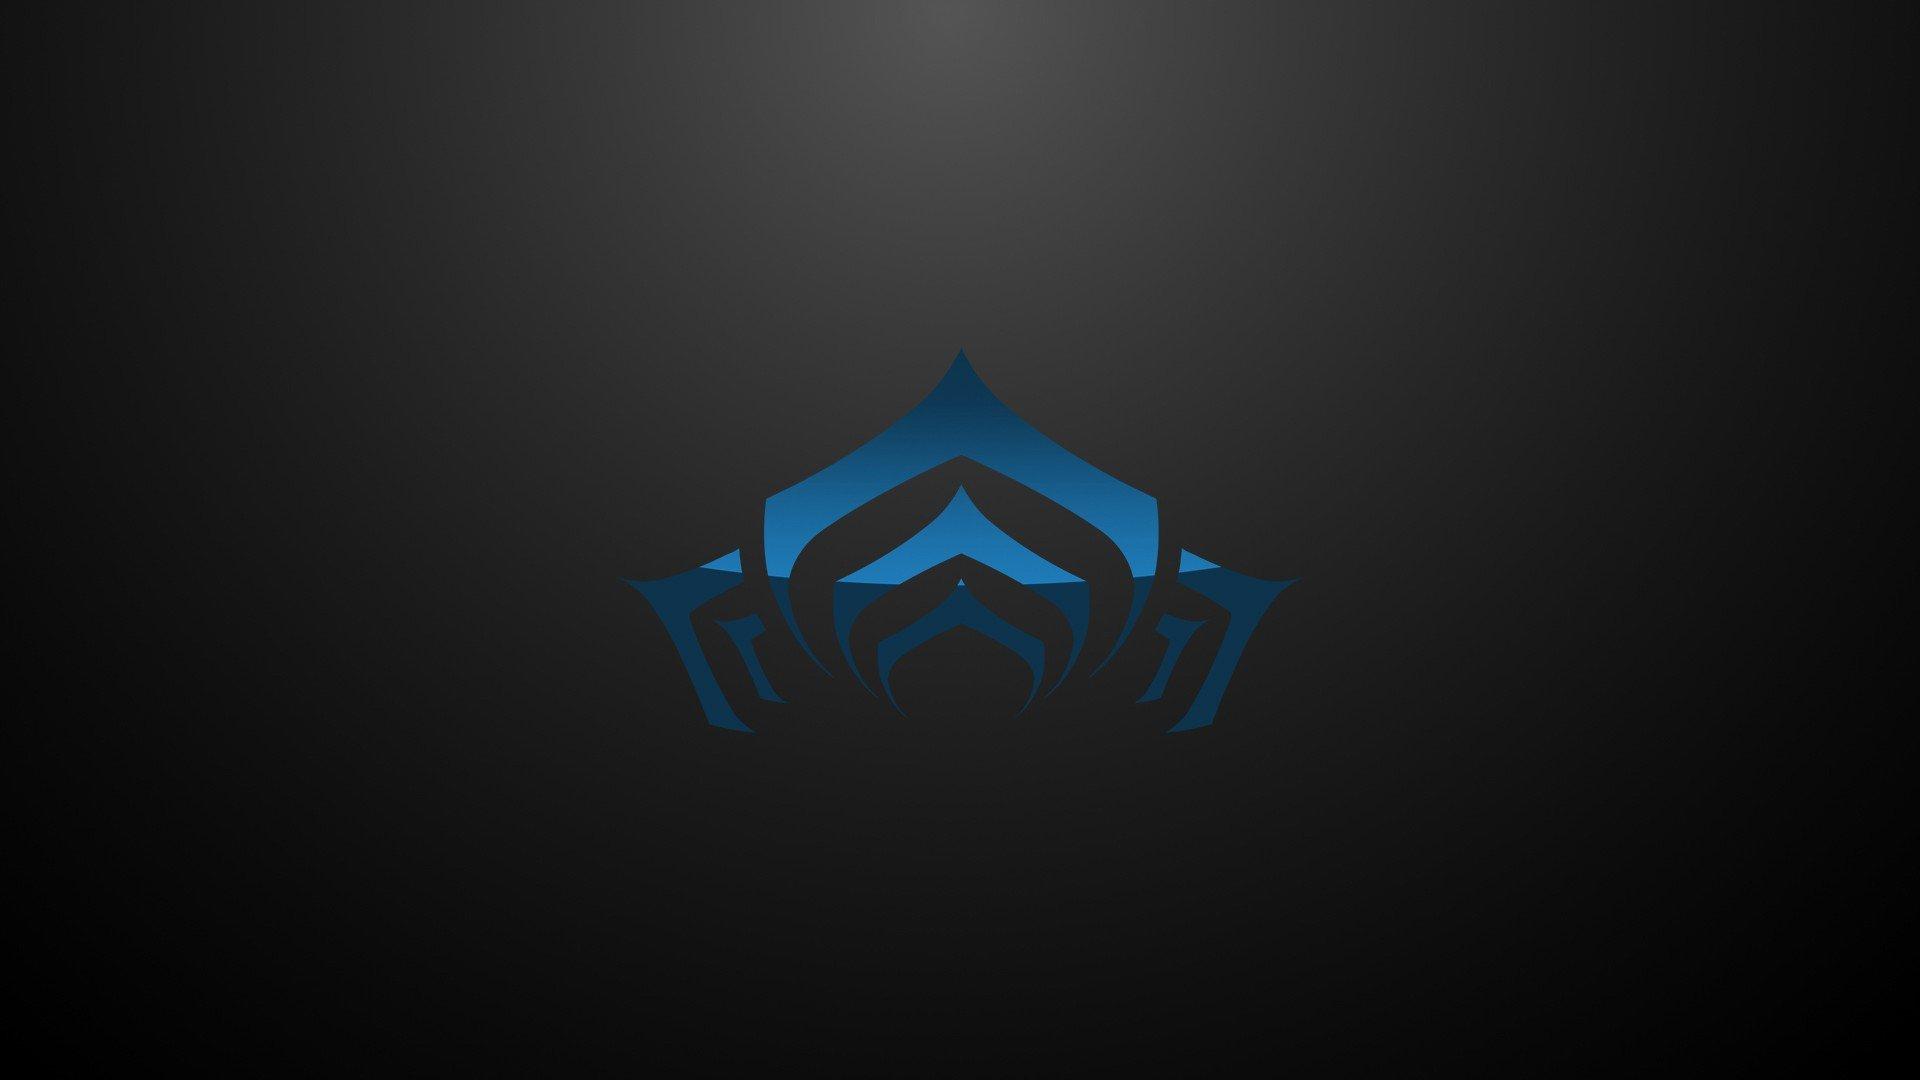 Wallpaper 1920x1080 Px Gradient Logo Simple Background